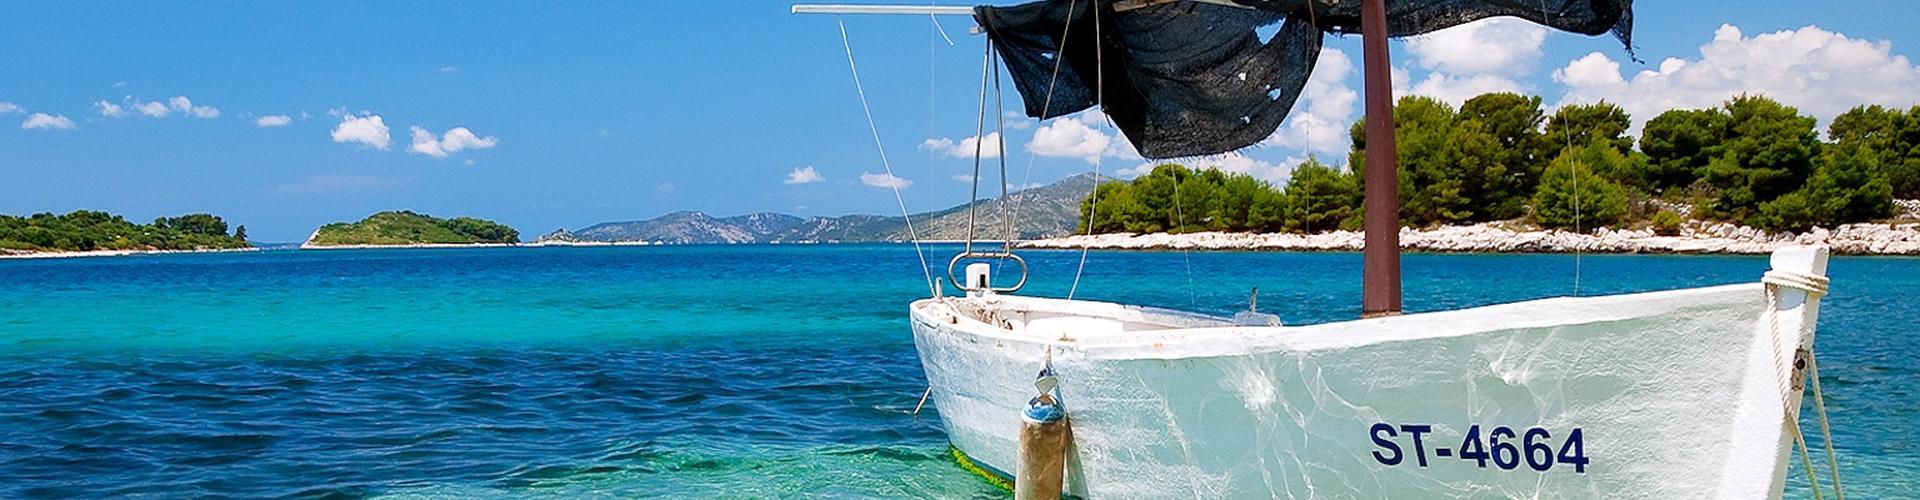 Urlaubsparadies Kroatien